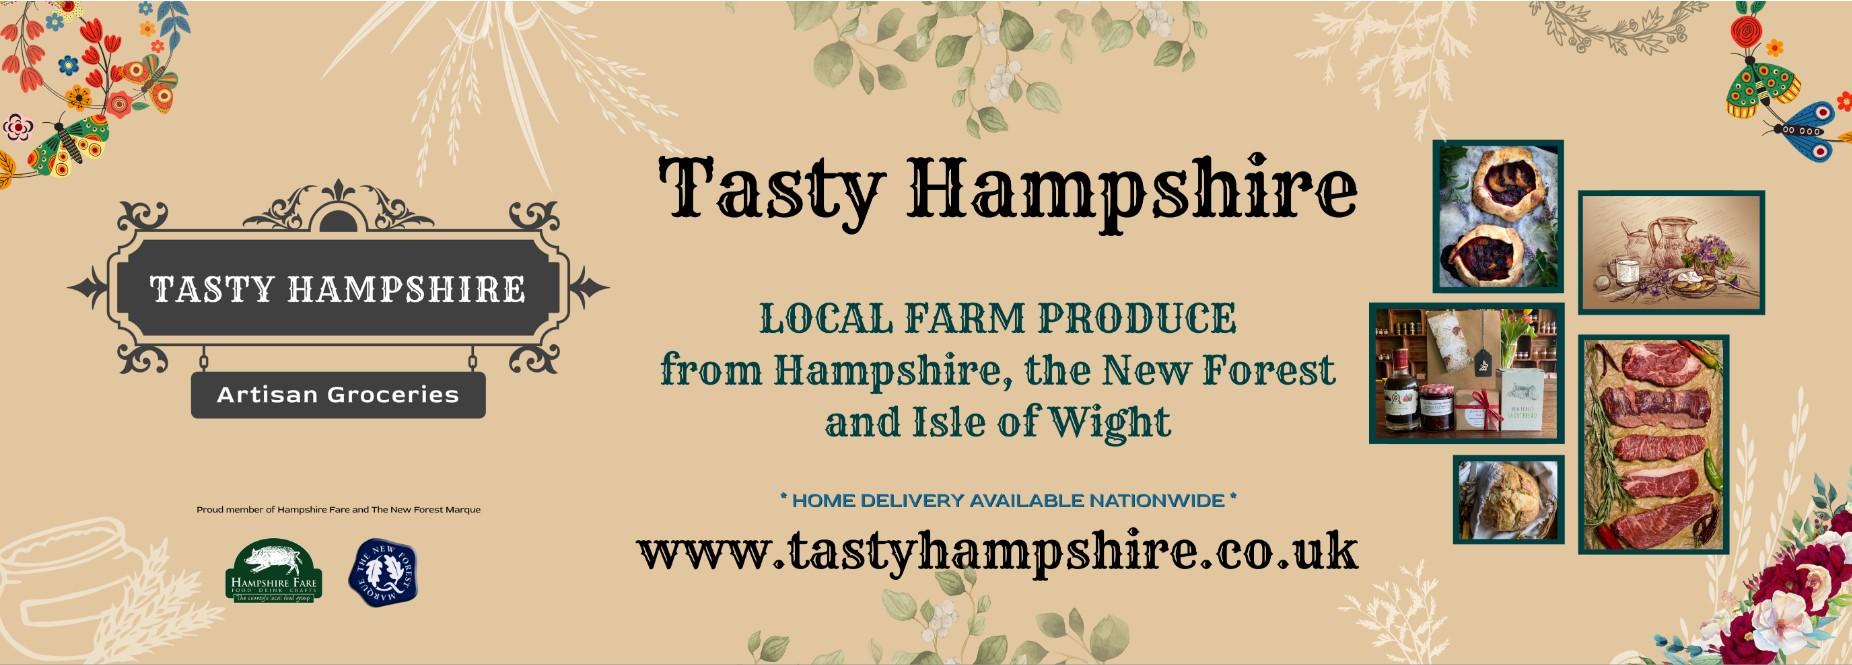 Tasty Hampshire